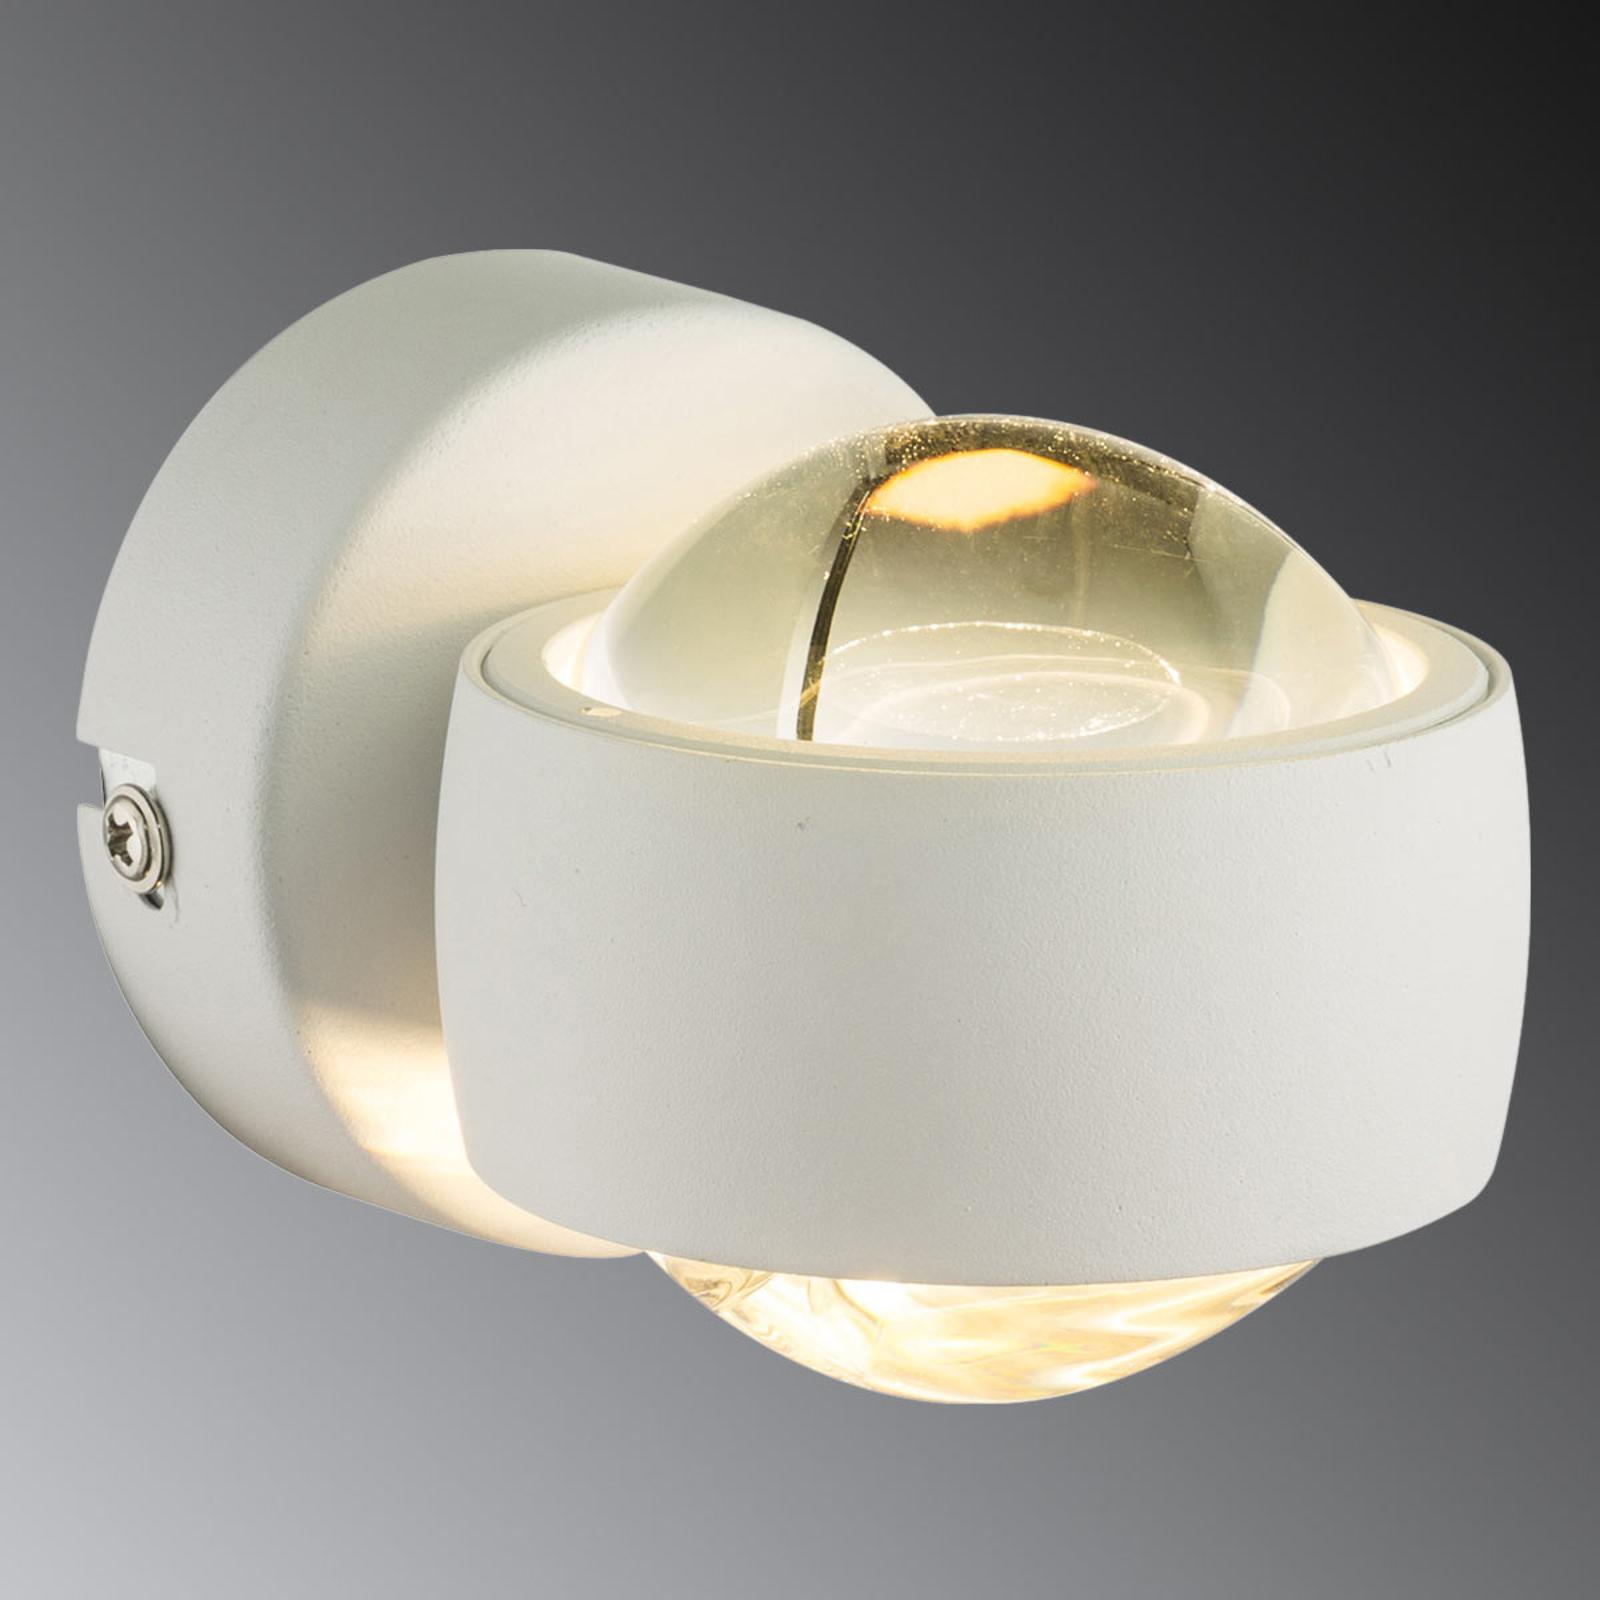 Petite applique murale LED blanche Randi